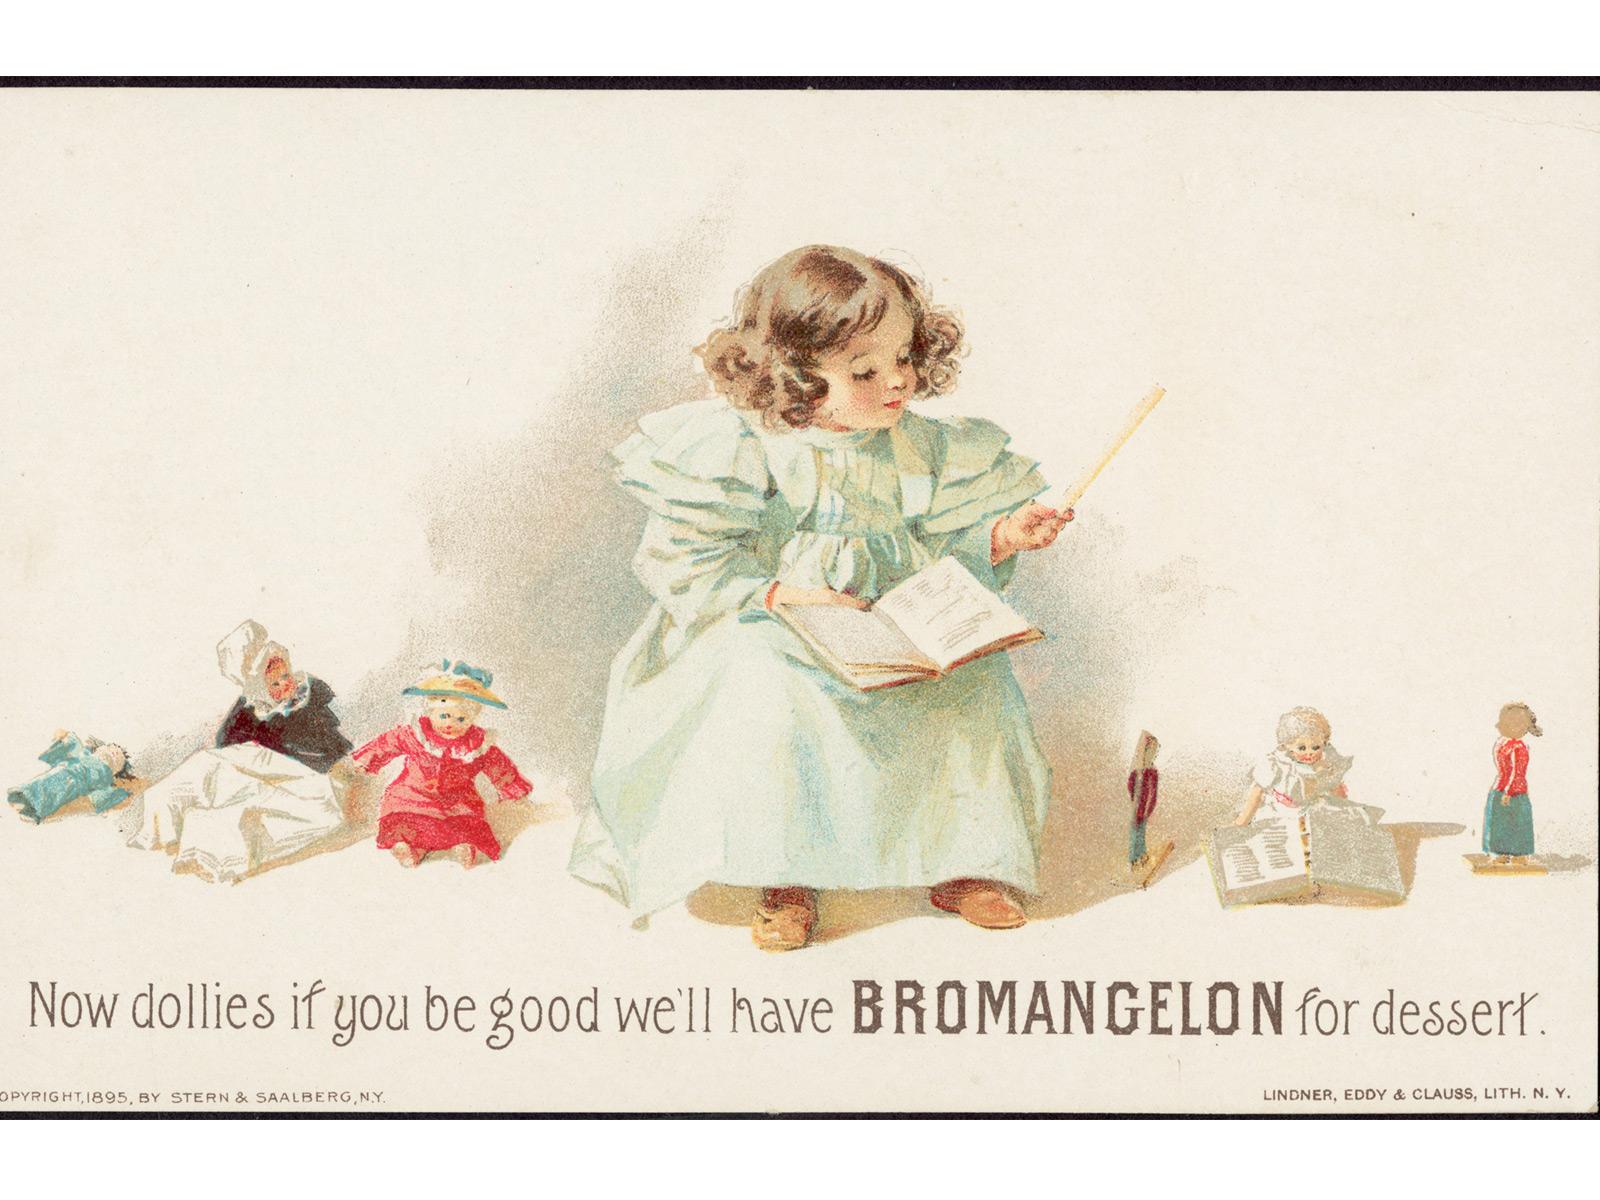 bromangelon-ad-dolls.jpg